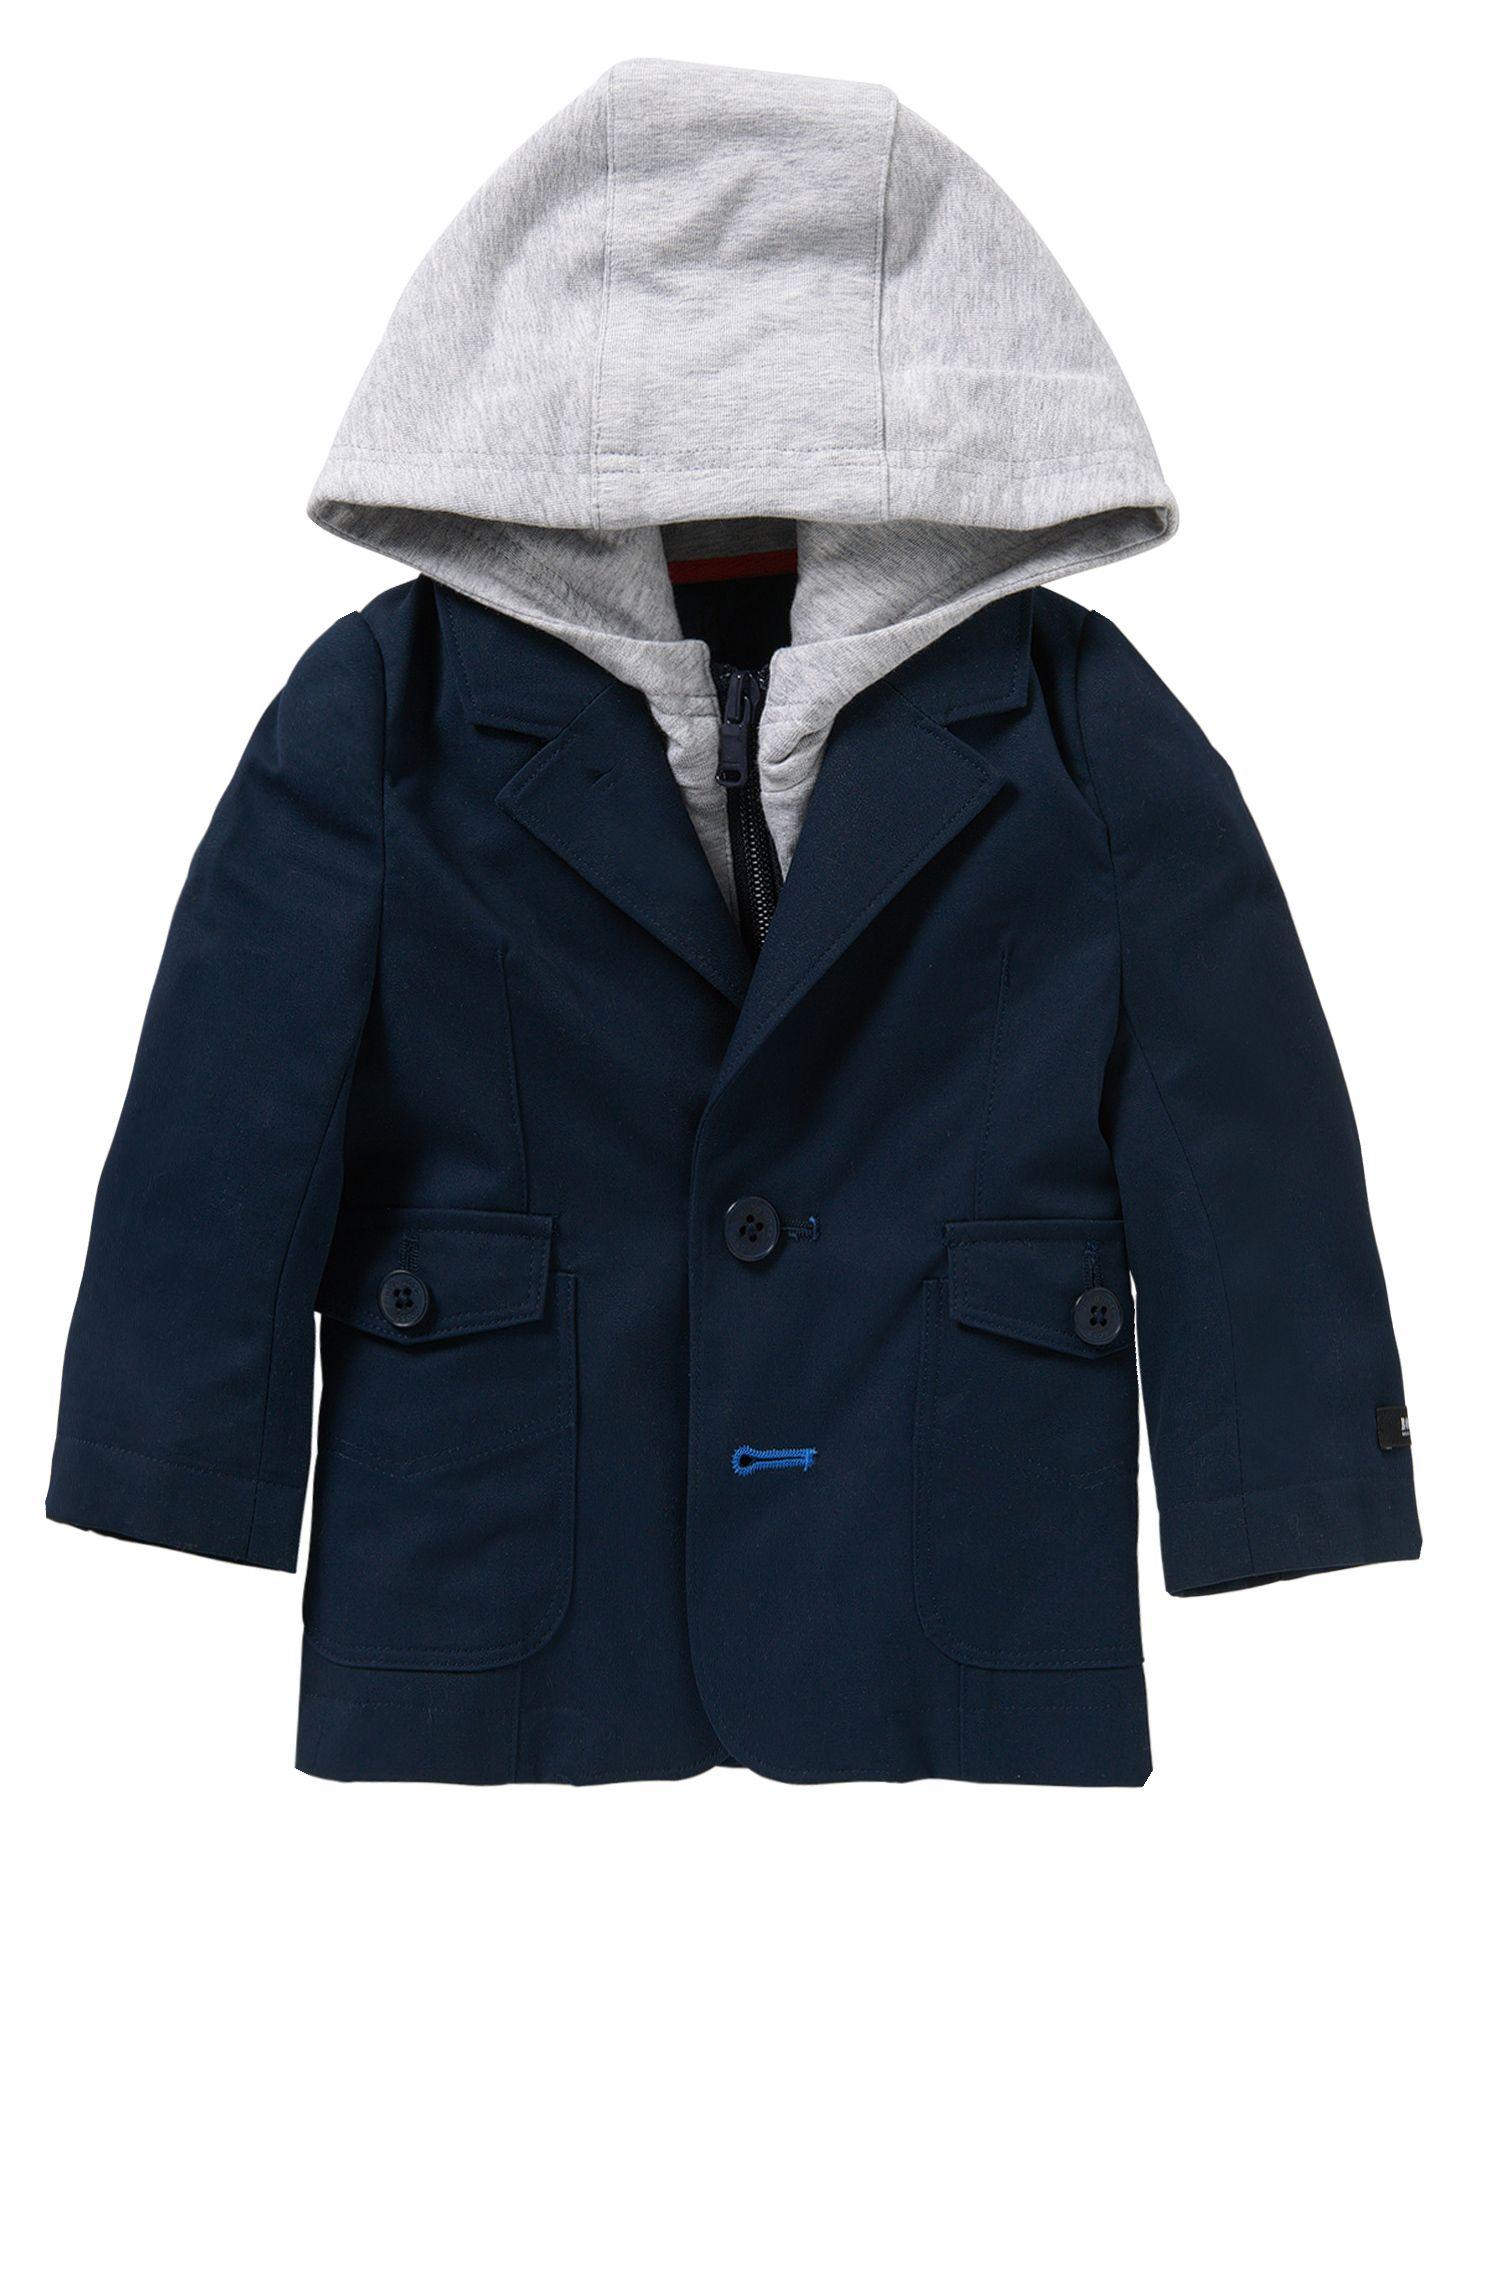 'J06138' | Newborn Cotton Sport Coat, Detachable Hood